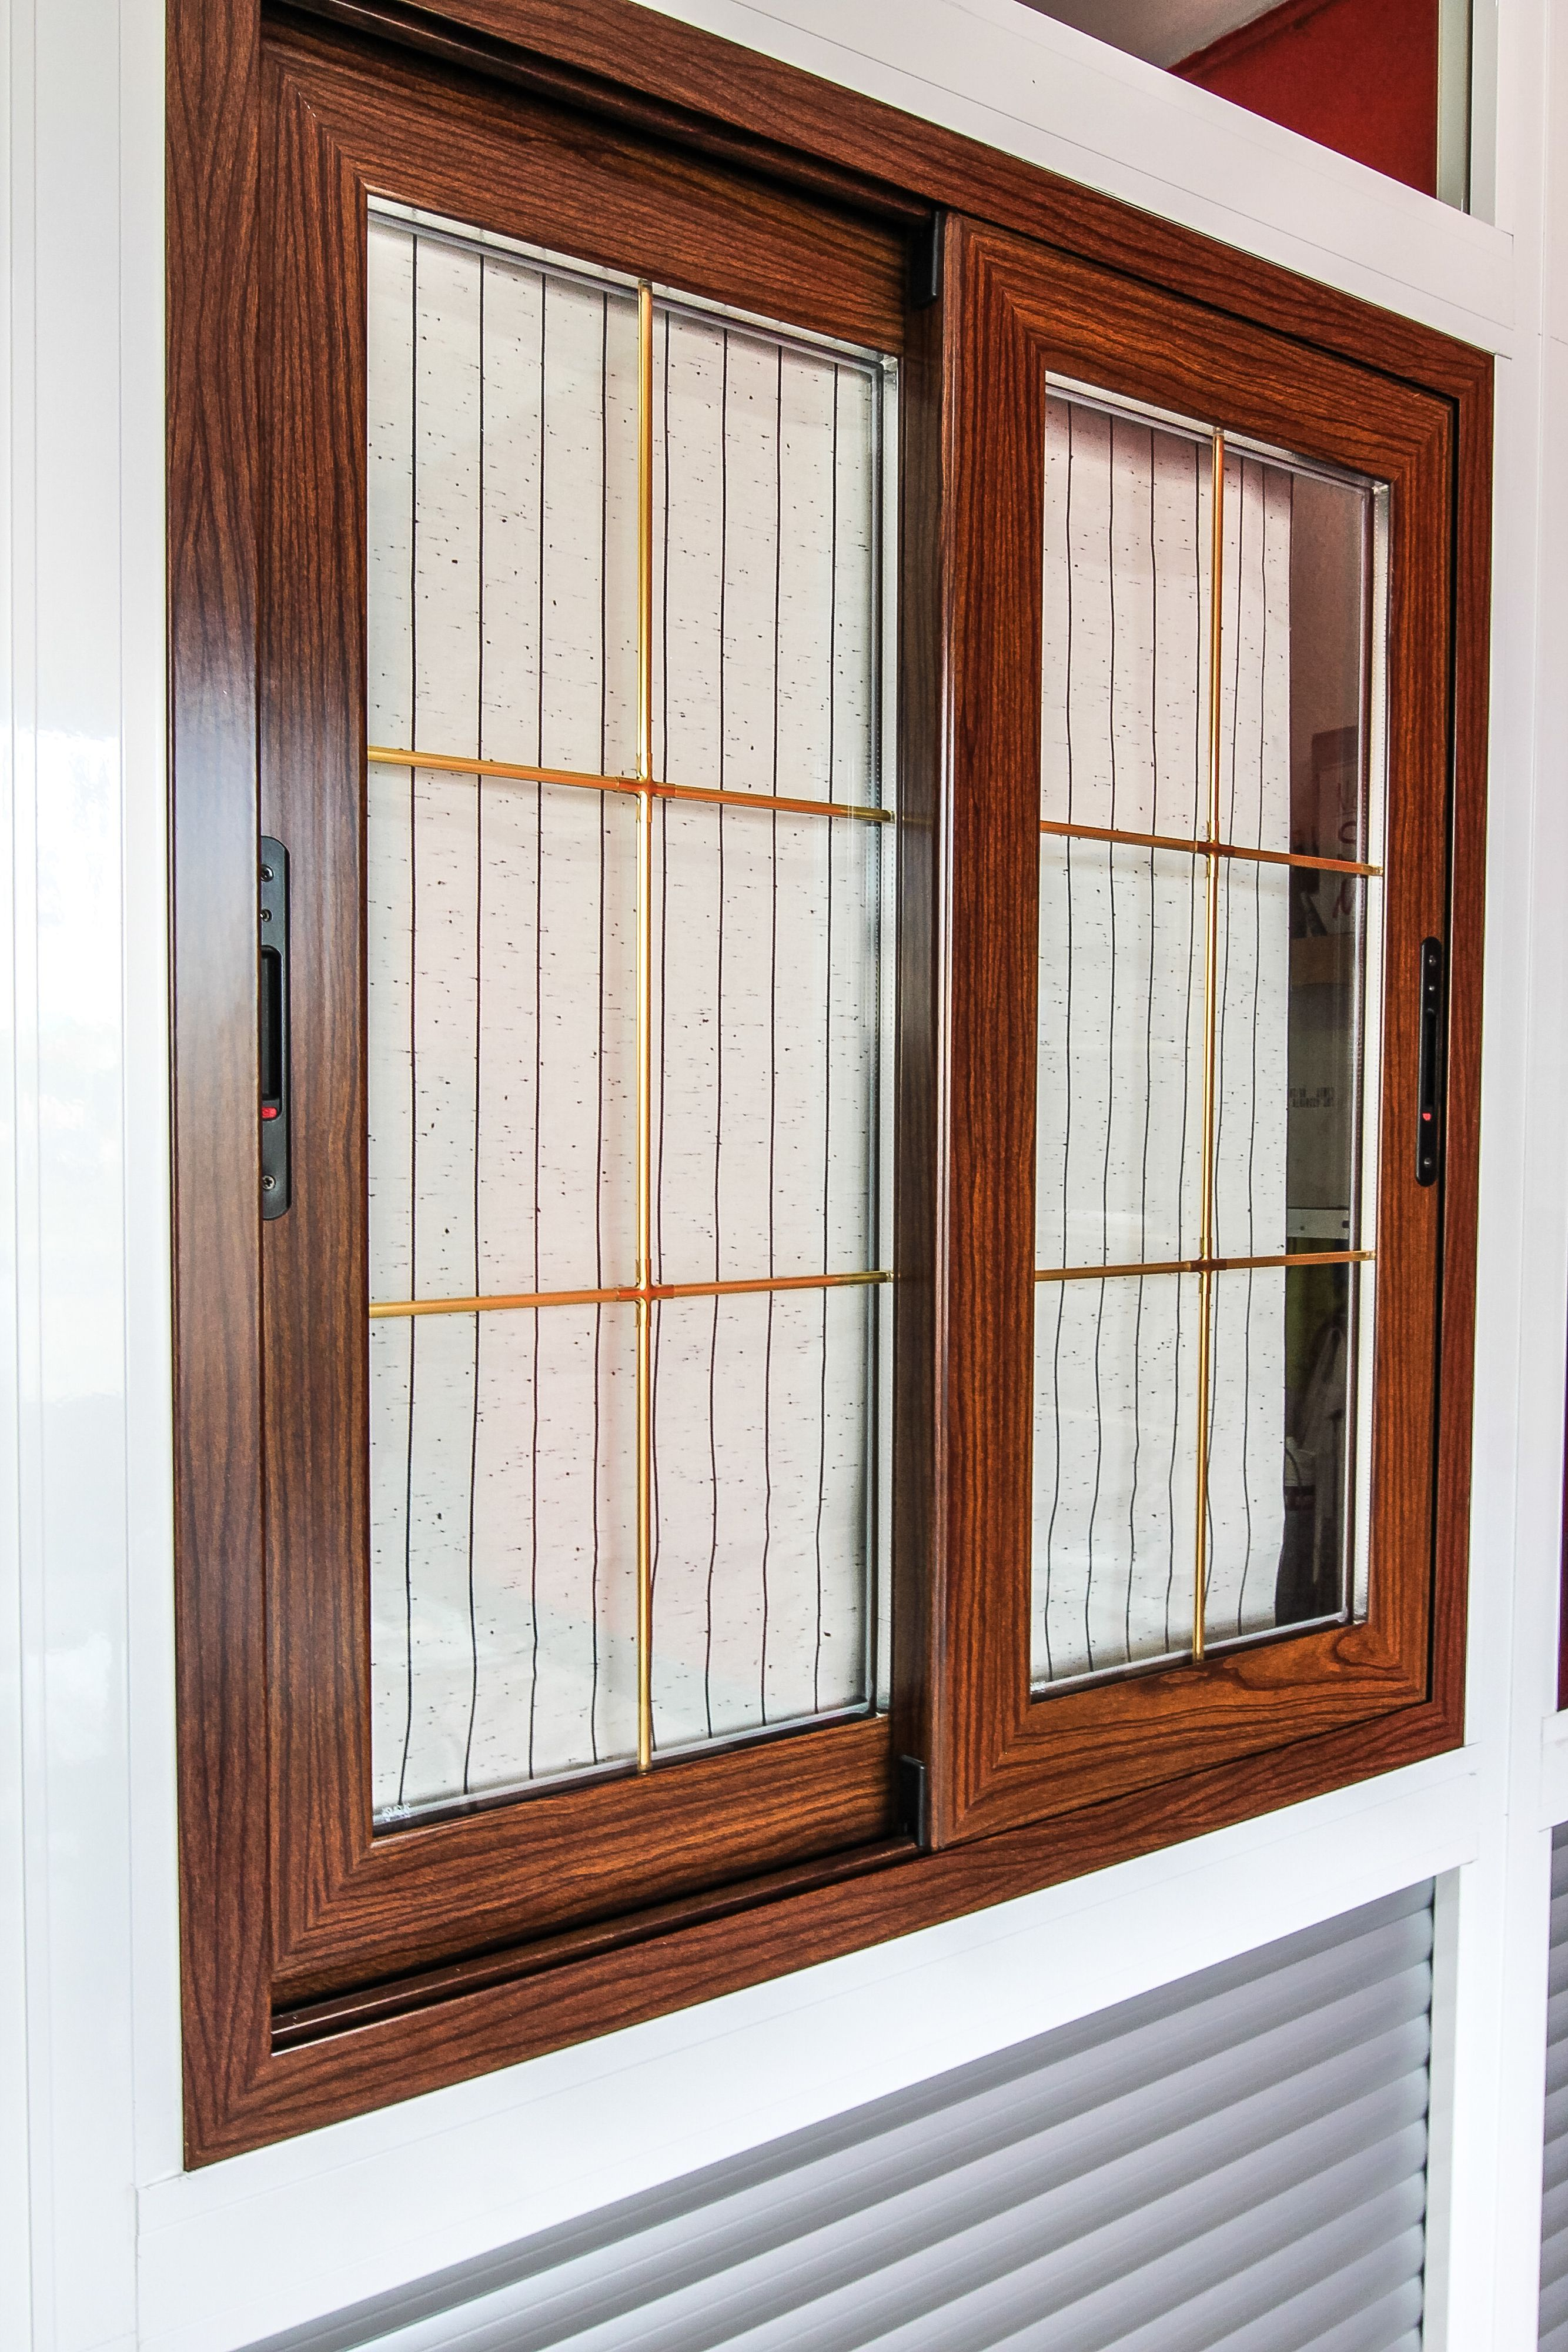 Comprar ventanas pvc online cheap tipos de ventanas de - Comprar ventanas baratas ...